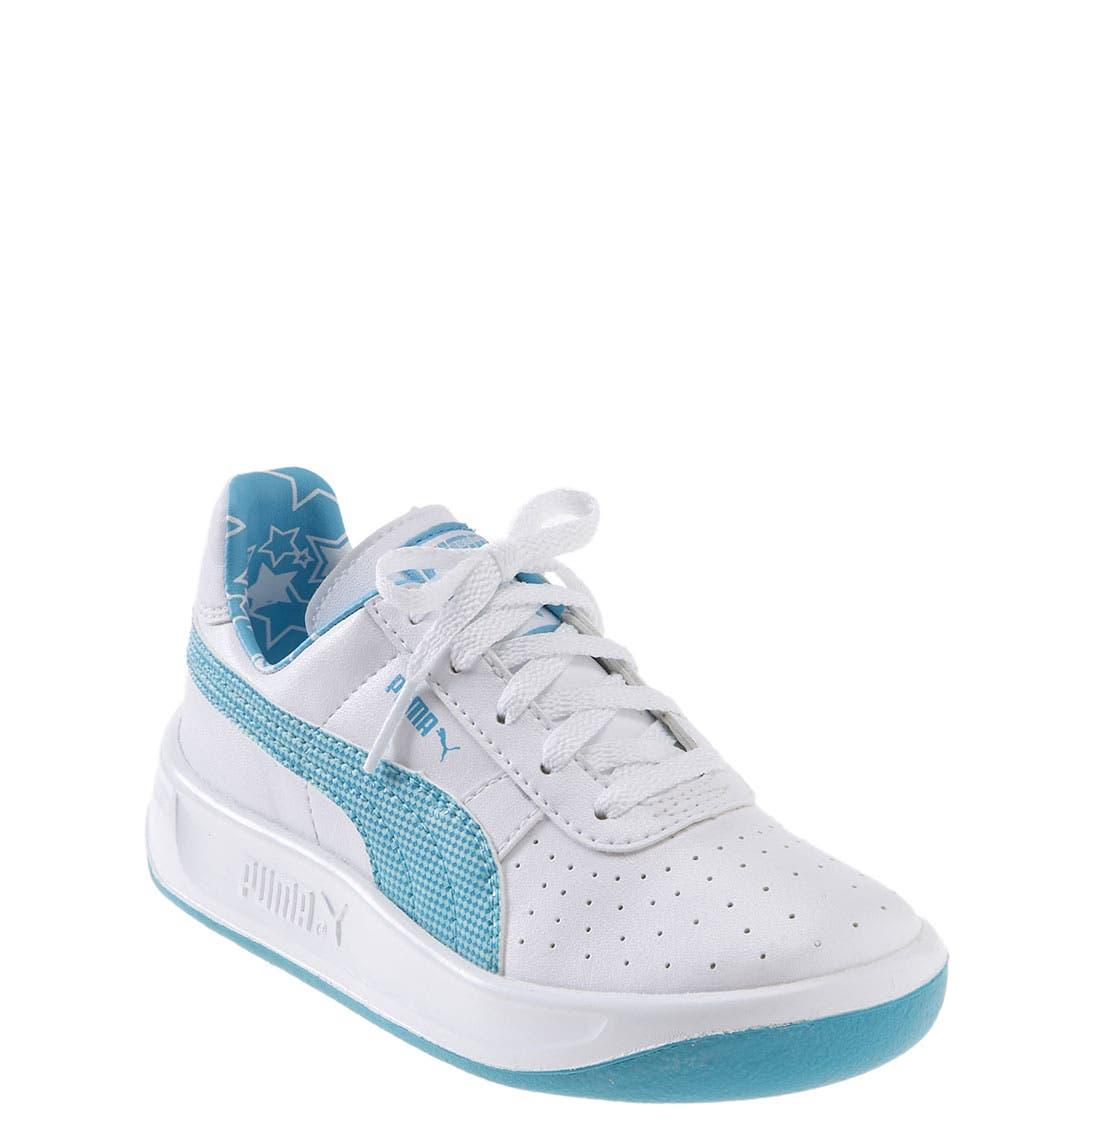 Main Image - Puma 'GV Glow' Sneaker (Baby, Walker, Toddler & Little Kid) (Nordstrom Exclusive)